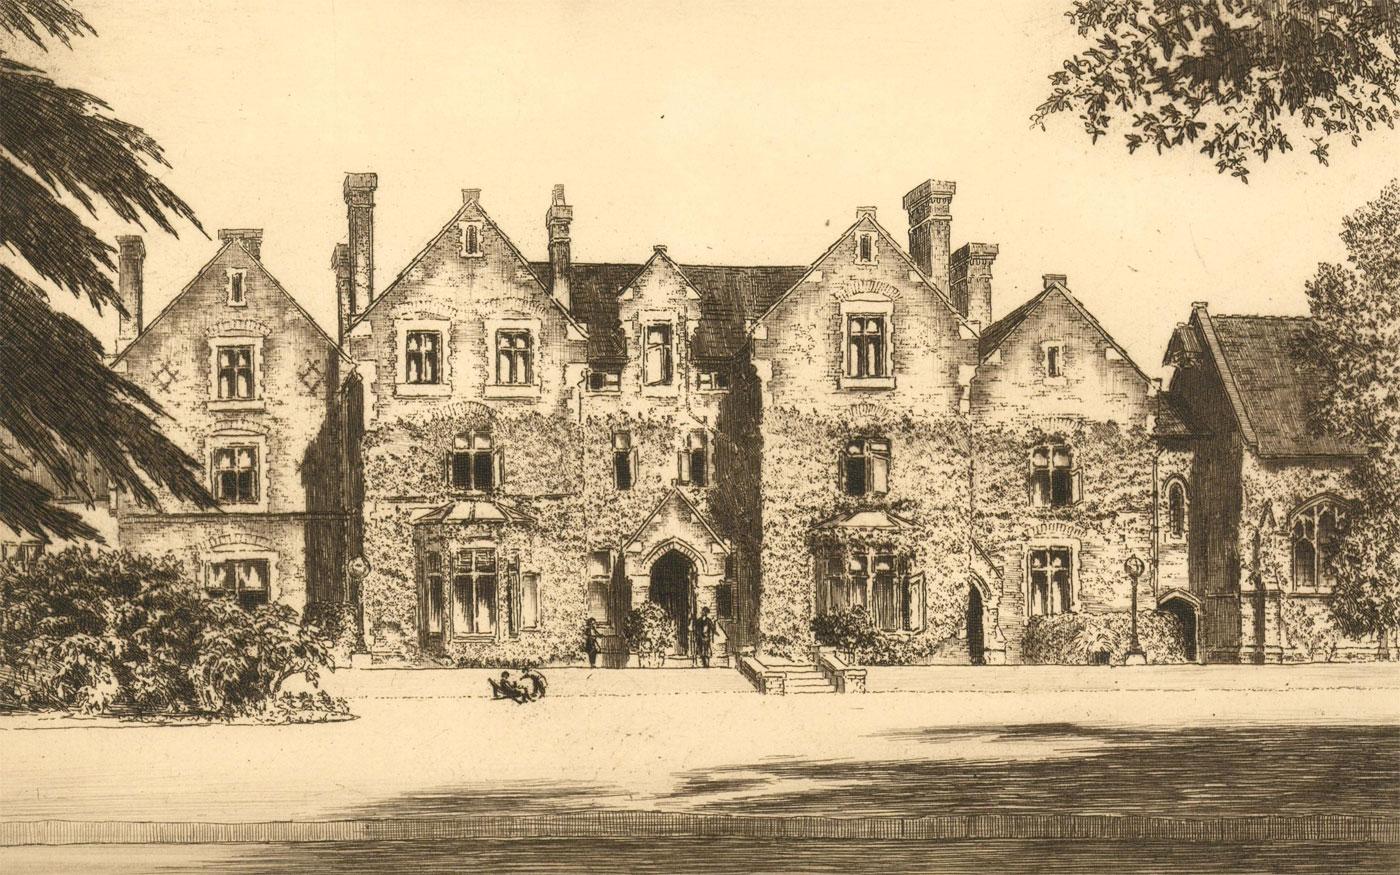 Charles Herbert Clark (b. 1890) - 20th Century Etching, Victorian Country House